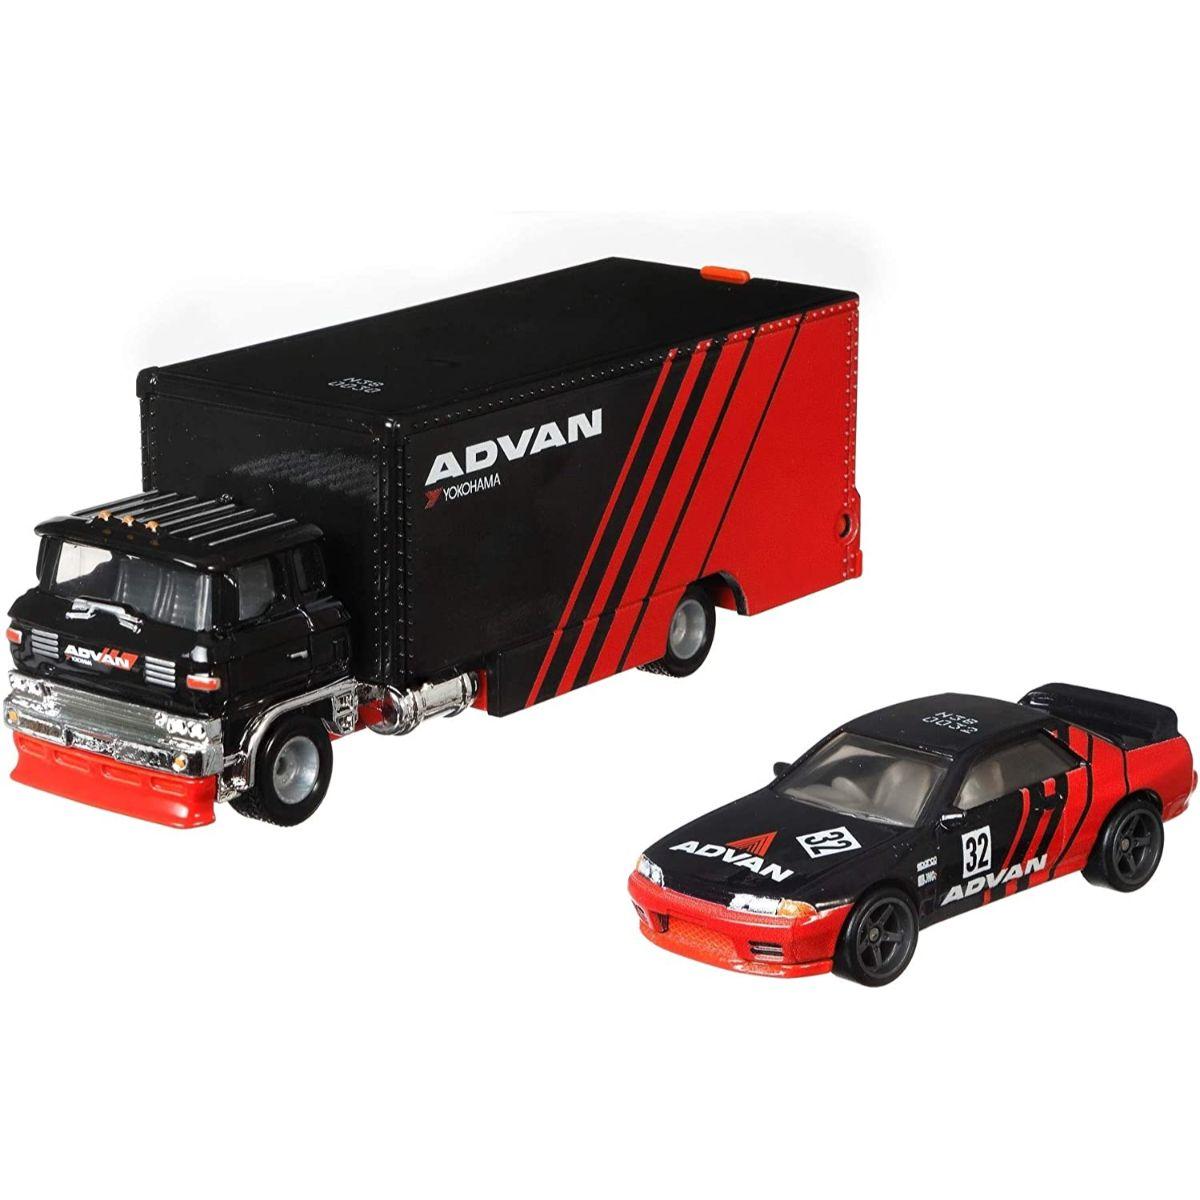 Transportator cu masinuta Hot Wheels, Nissan Skyline Gt-R, Sakura, GRK55, 1:64